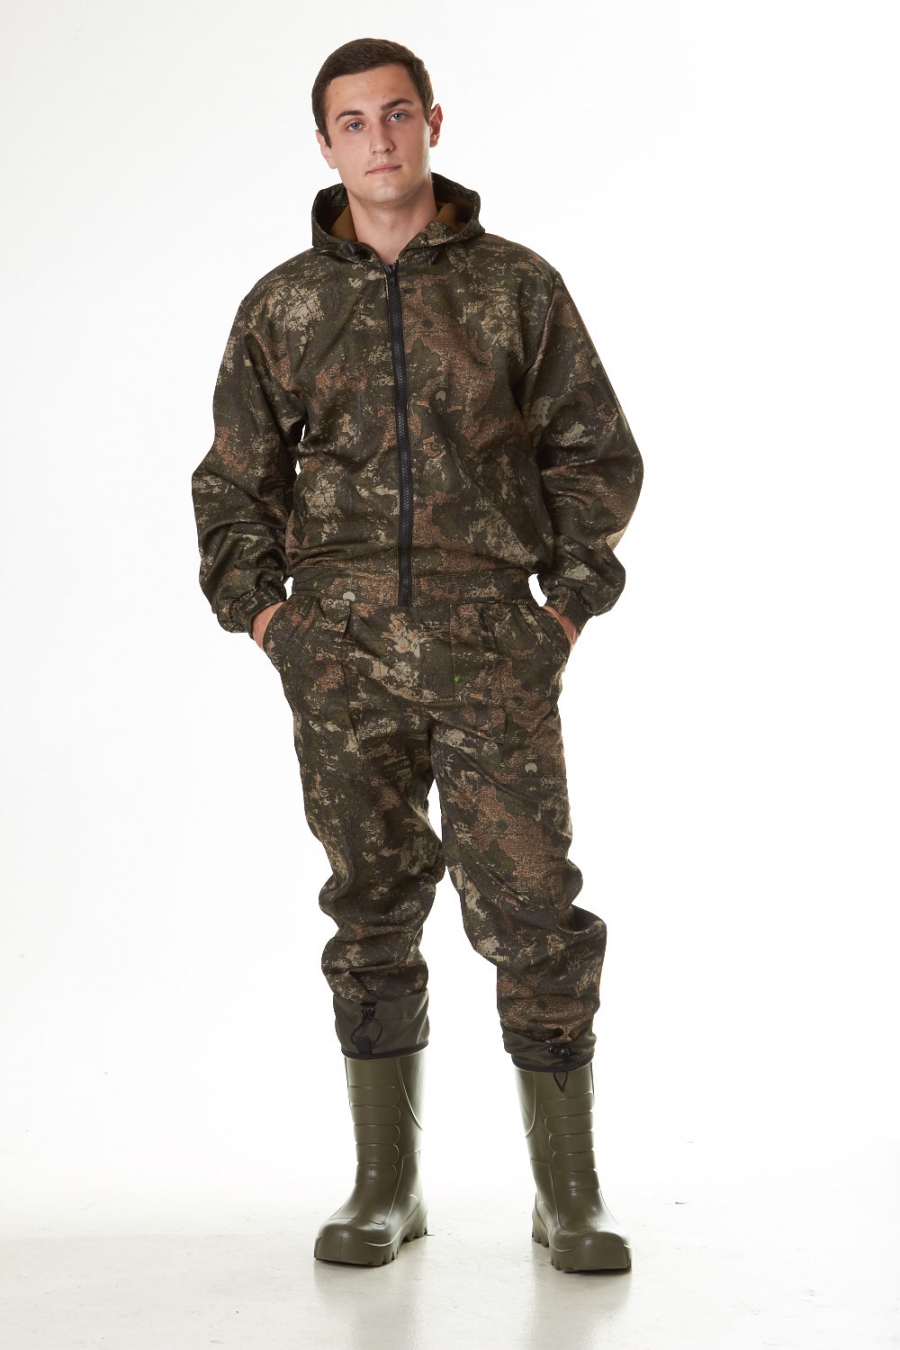 Костюм для охоты и рыбалки ЛесникОдежда для охоты и рыбалки<br><br><br>Размер: 60